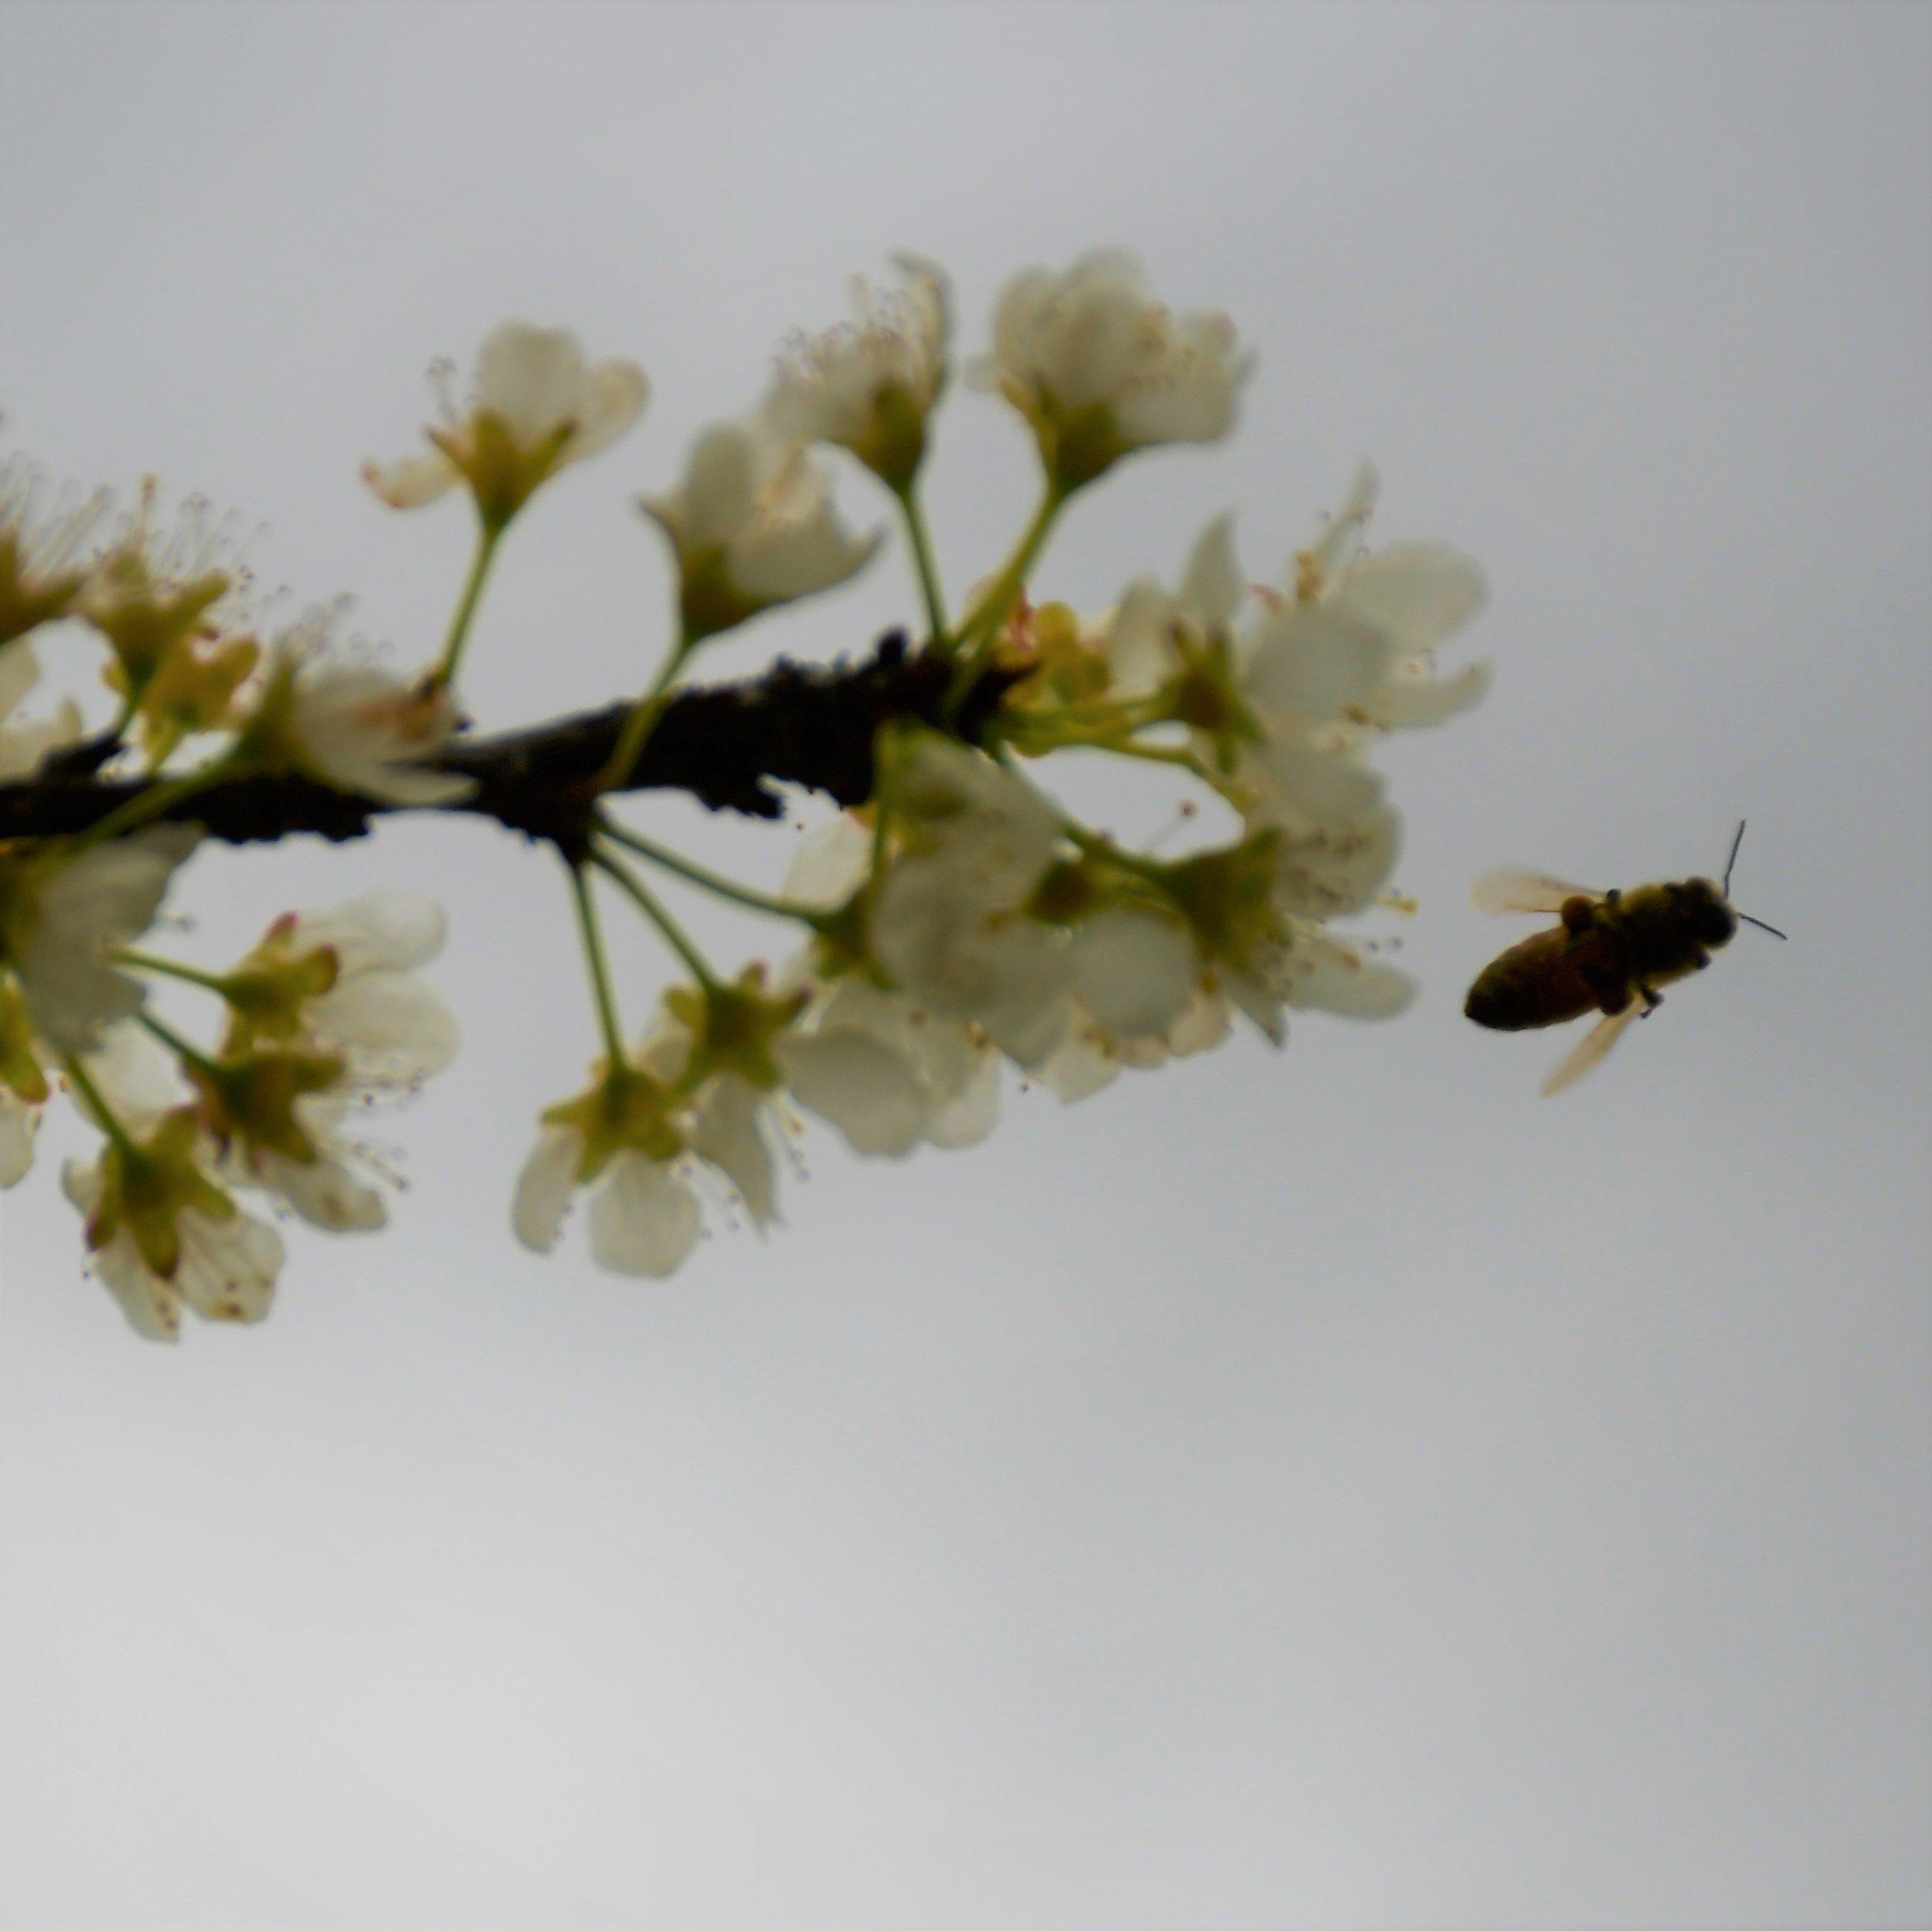 Dapple Dandy Blossom Bee flying.jpg